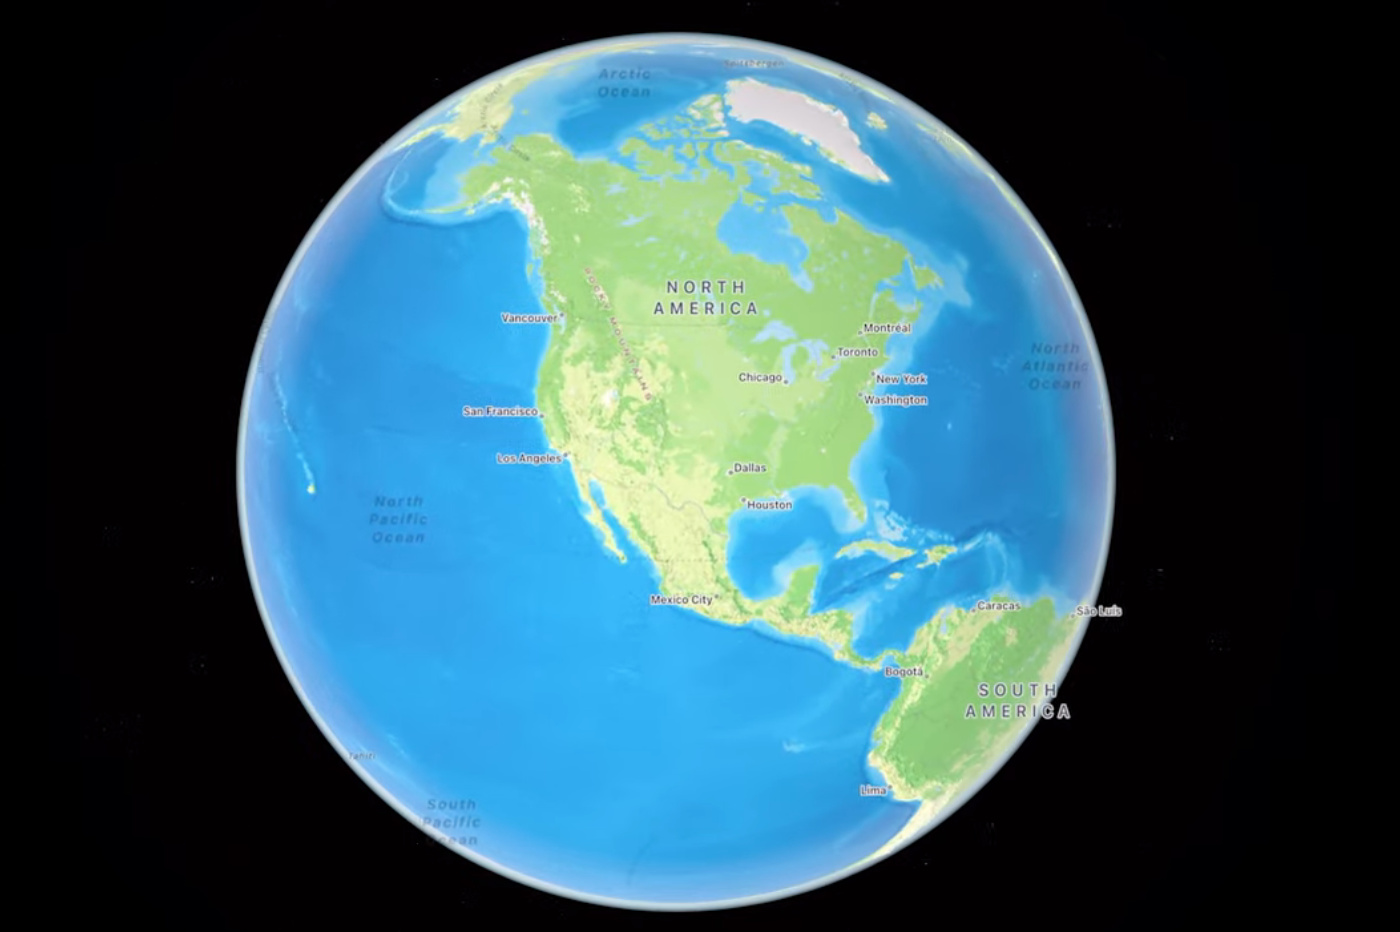 iOS 15 maps